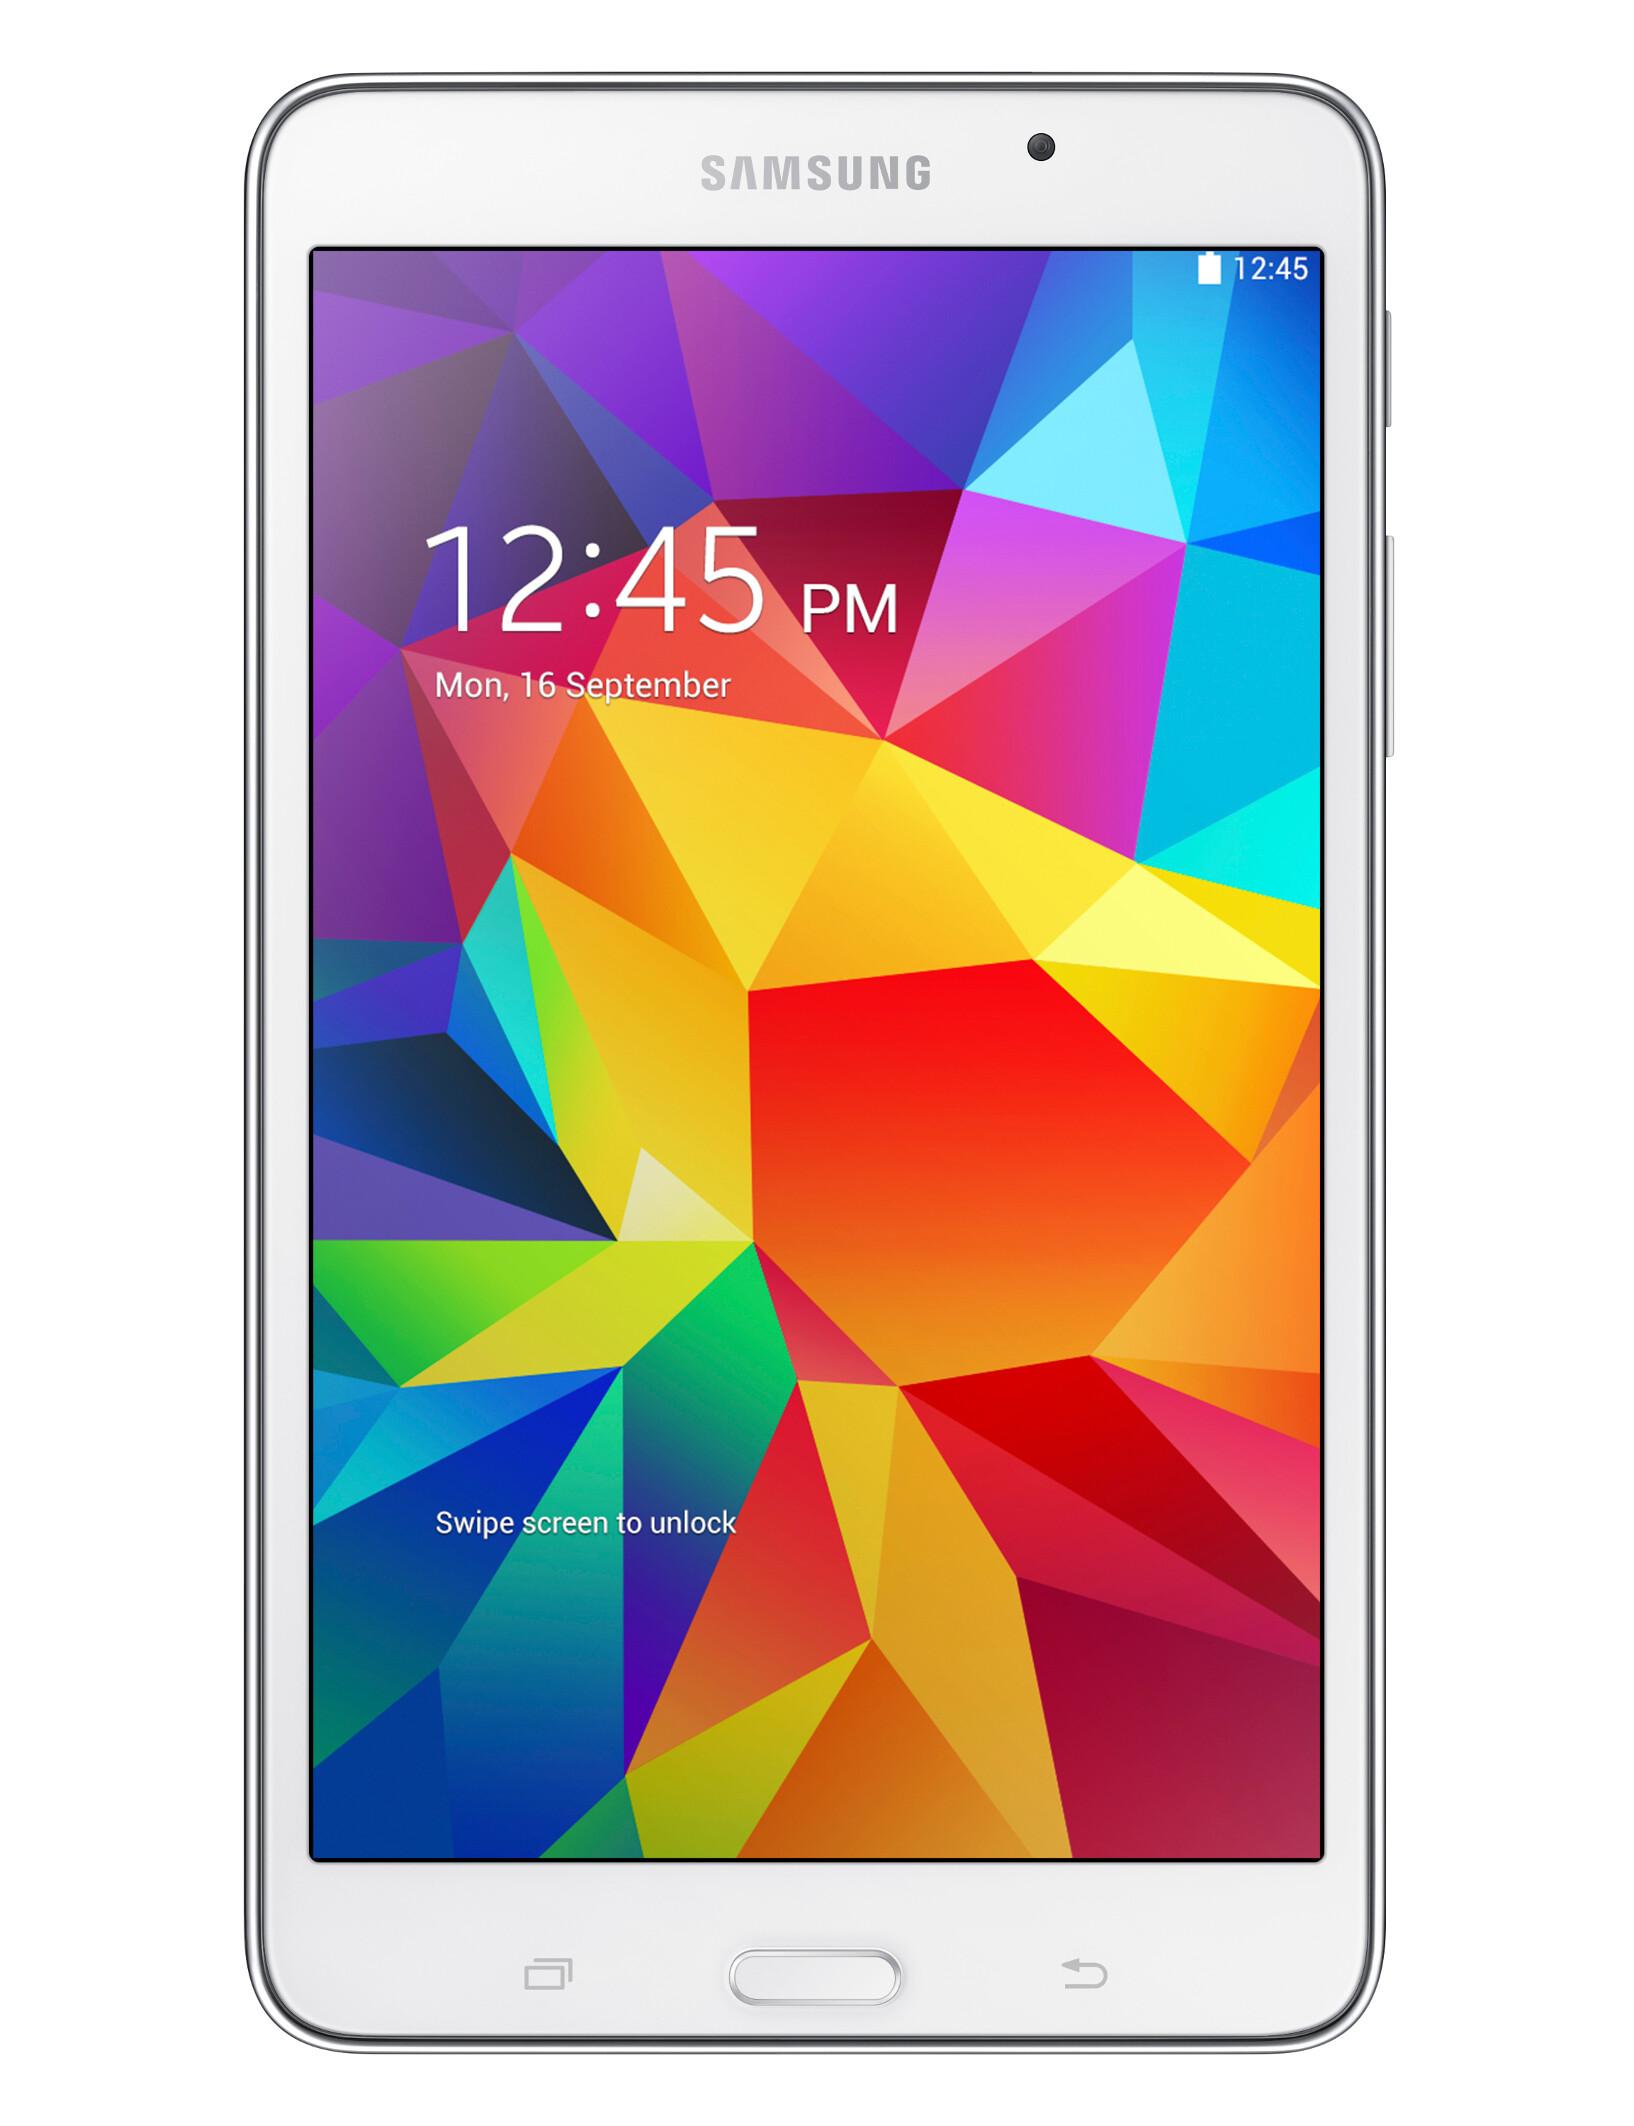 Samsung Galaxy Tab 4 7.0 specs